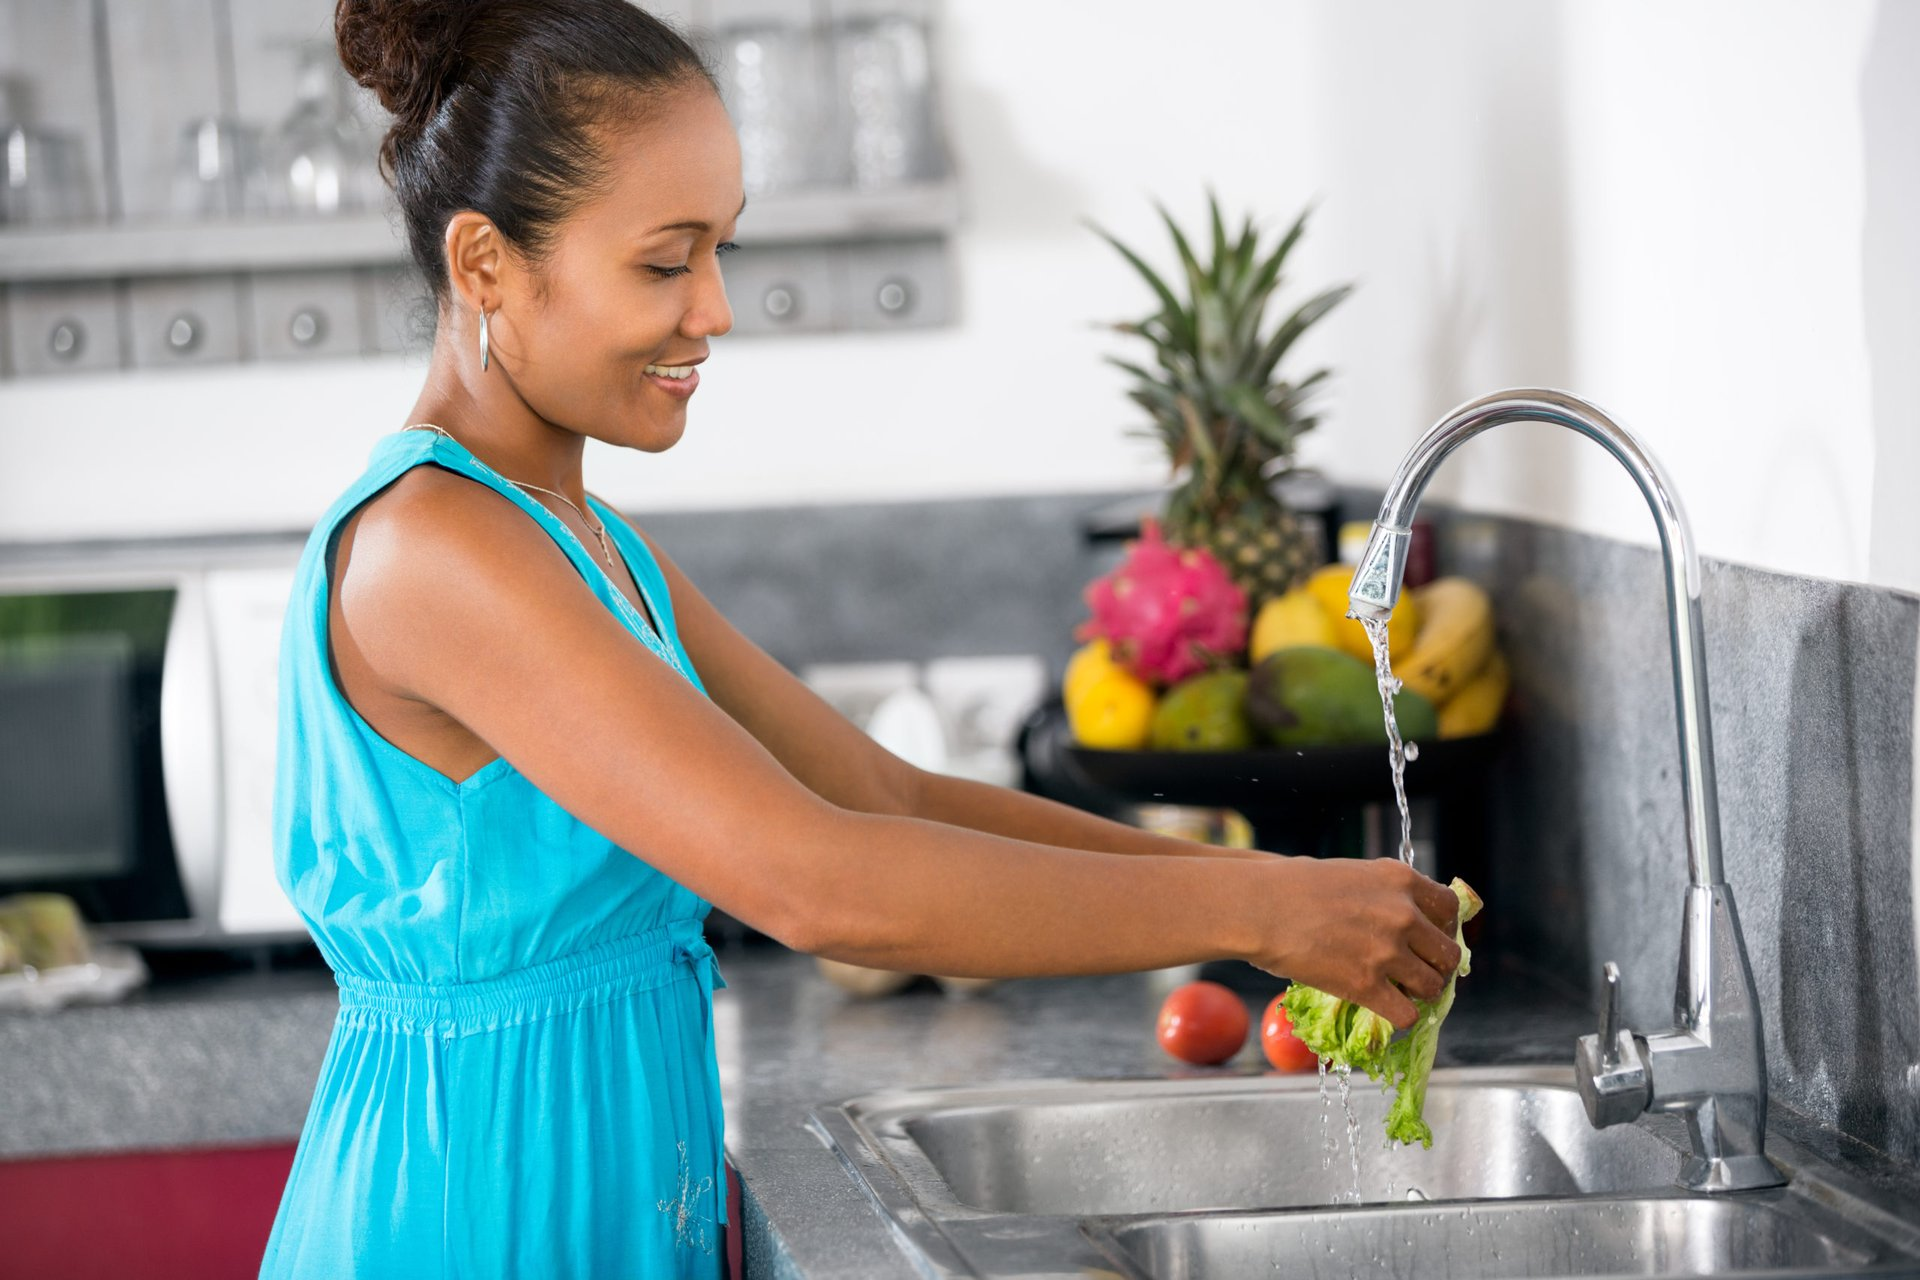 Woman washing produce